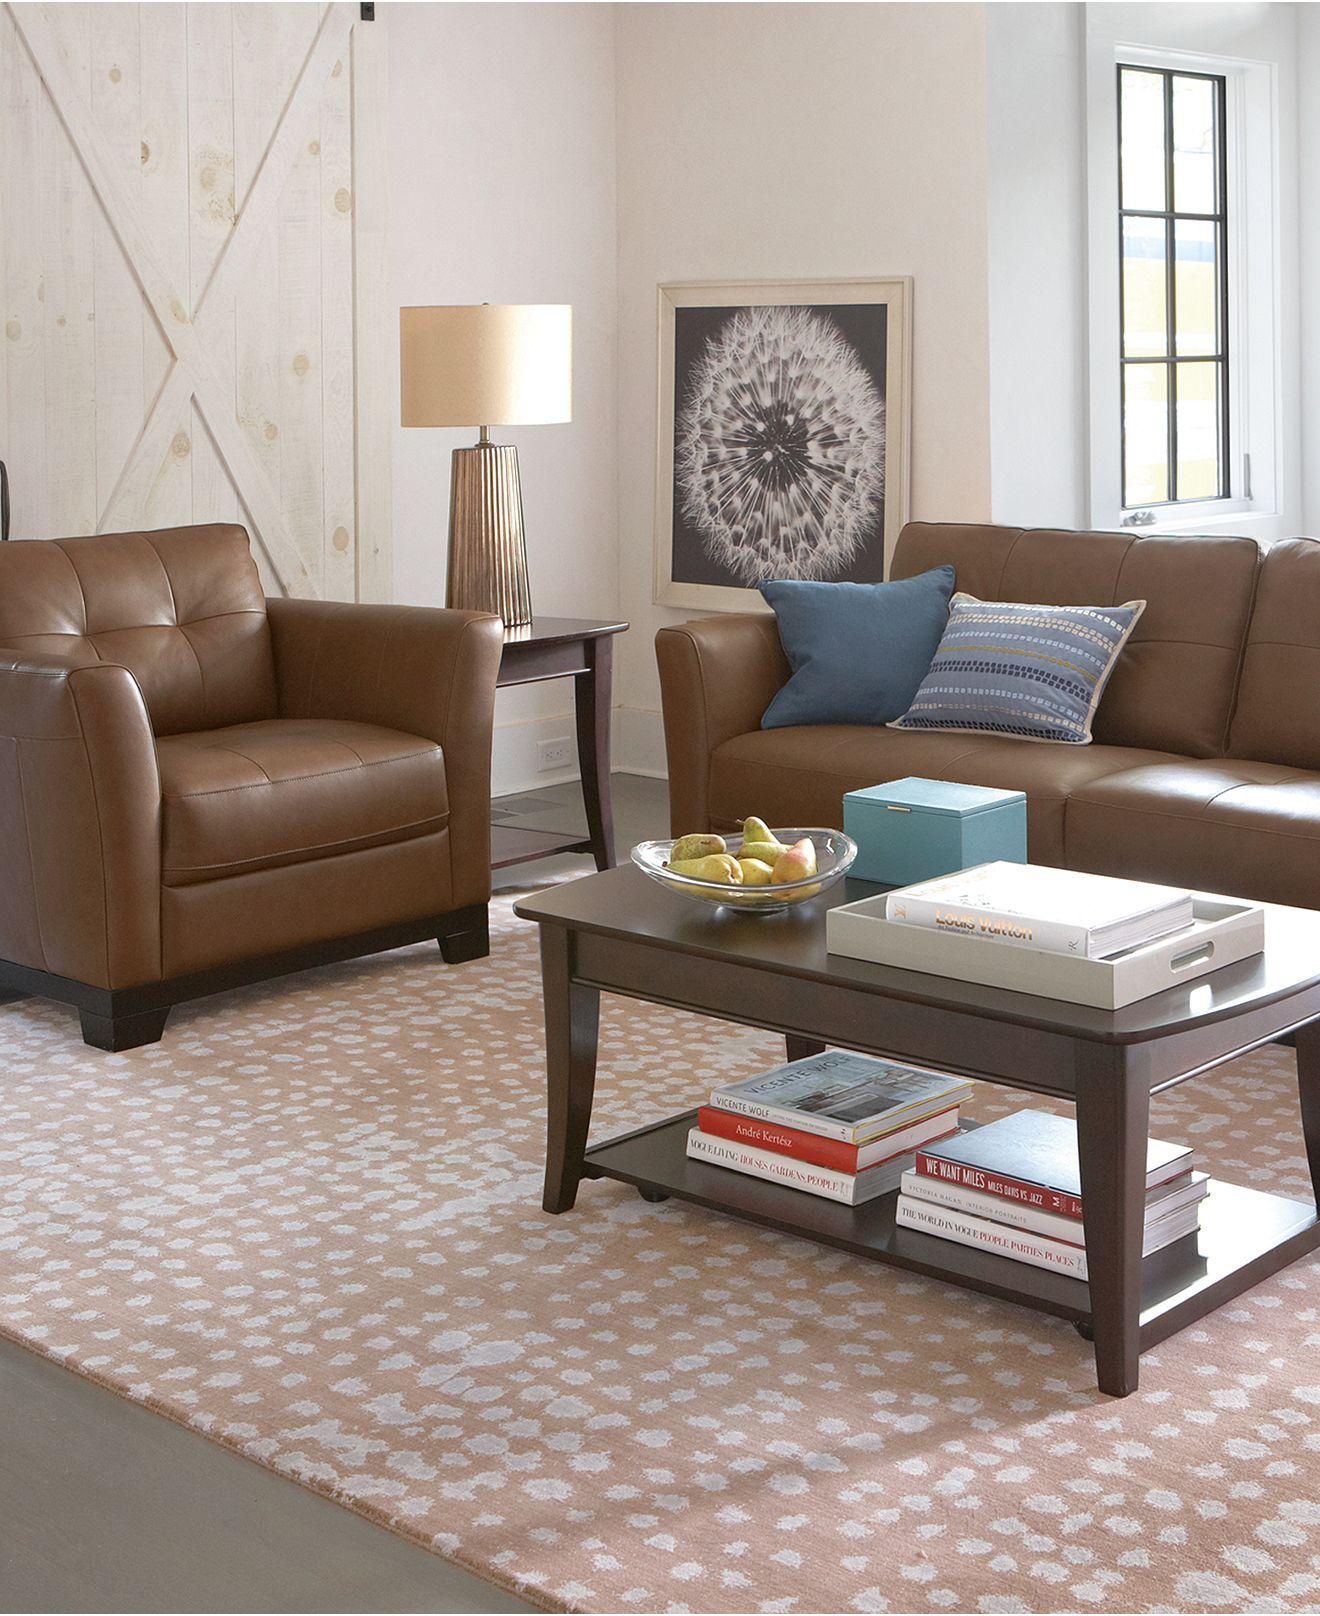 Martino Leather Sofa Living Room Furniture Collection Furniture Macy S Living Room Furniture Collections Leather Sofa Living Room Living Room Furniture